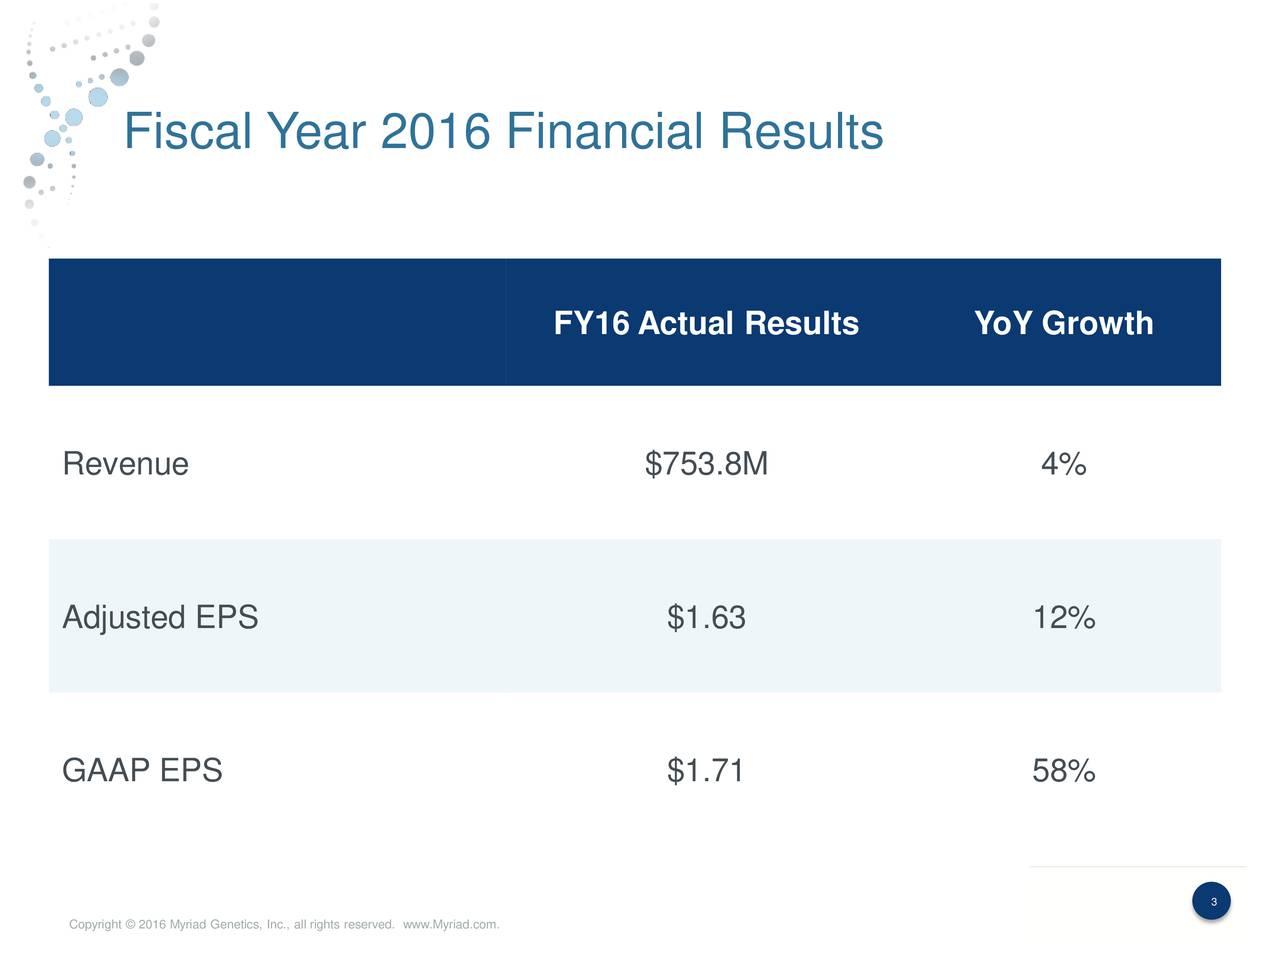 FY16 Actual Results YoY Growth Revenue $753.8M 4% Adjusted EPS $1.63 12% GAAP EPS $1.71 58% 3 3 Copyright  2016 Myriad Genetics, Inc., all rights reserved. www.Myriad.com.